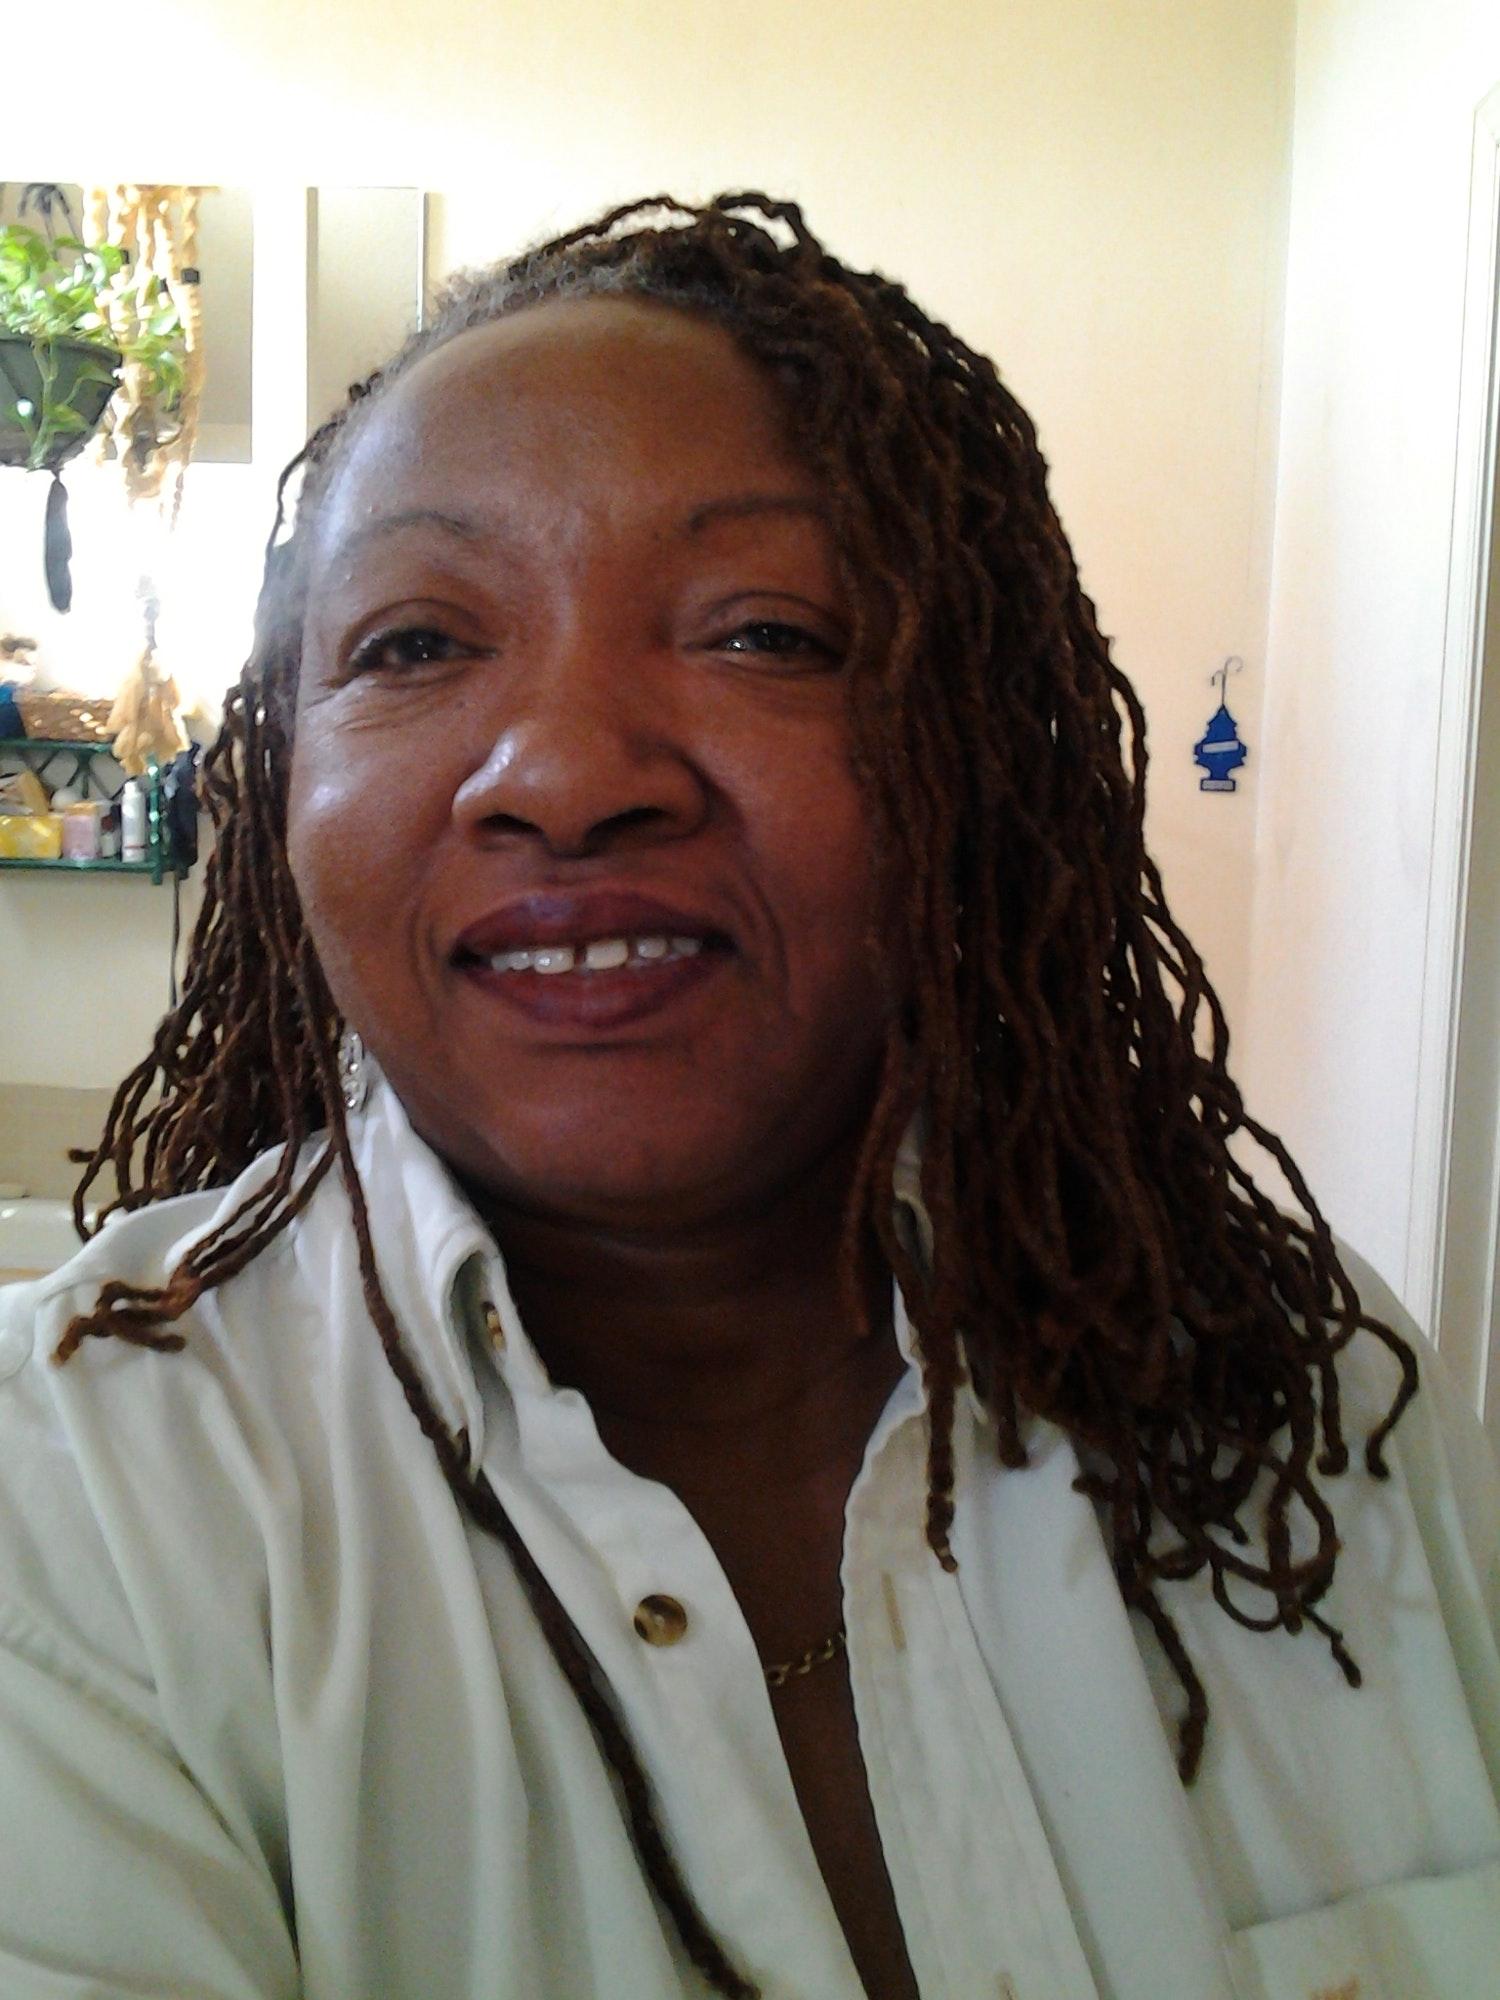 Janice H. teaches tennis lessons in Suffolk, VA